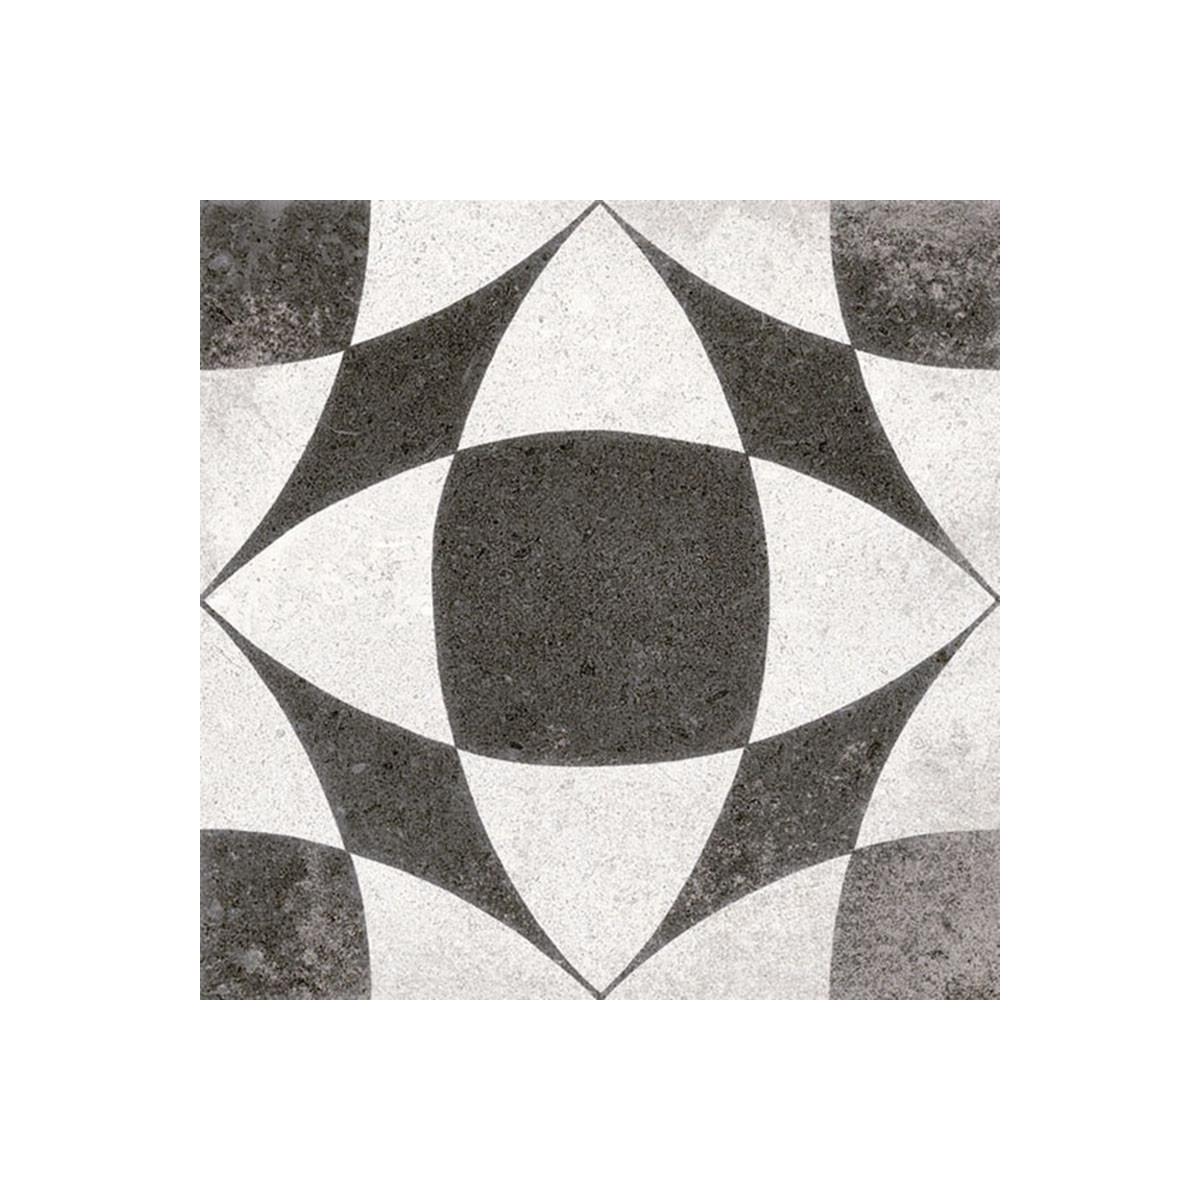 Pavimento hidráulico porcelánico antideslizante - Berkane Negro 20x20 (m2)